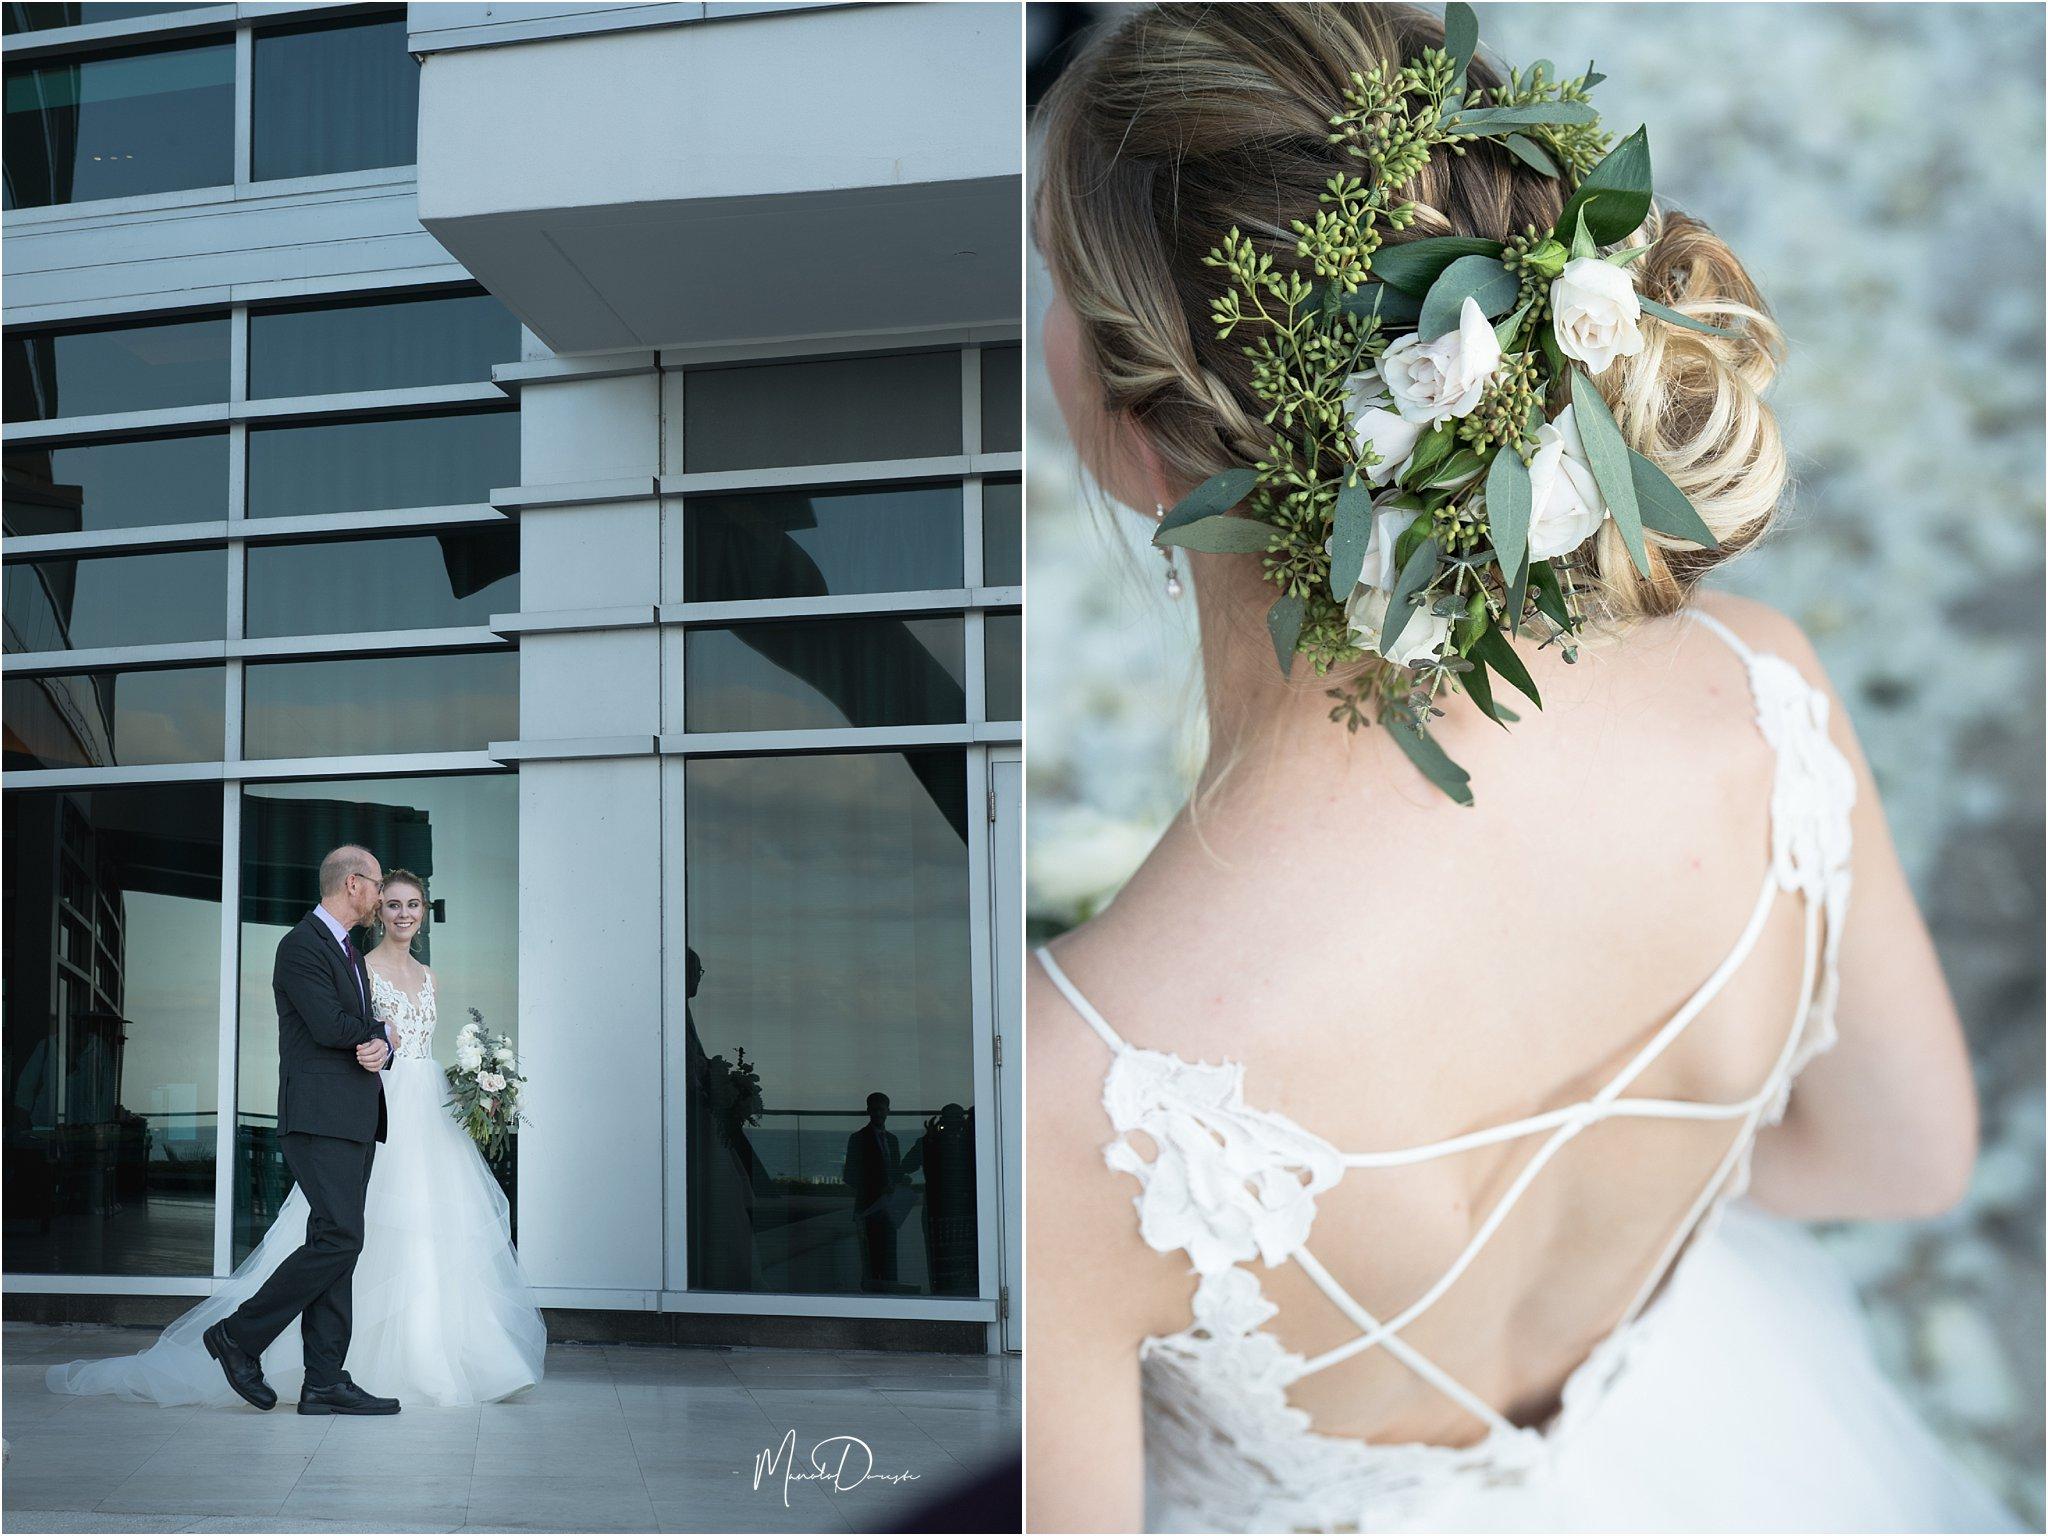 00883_ManoloDoreste_InFocusStudios_Wedding_Family_Photography_Miami_MiamiPhotographer.jpg